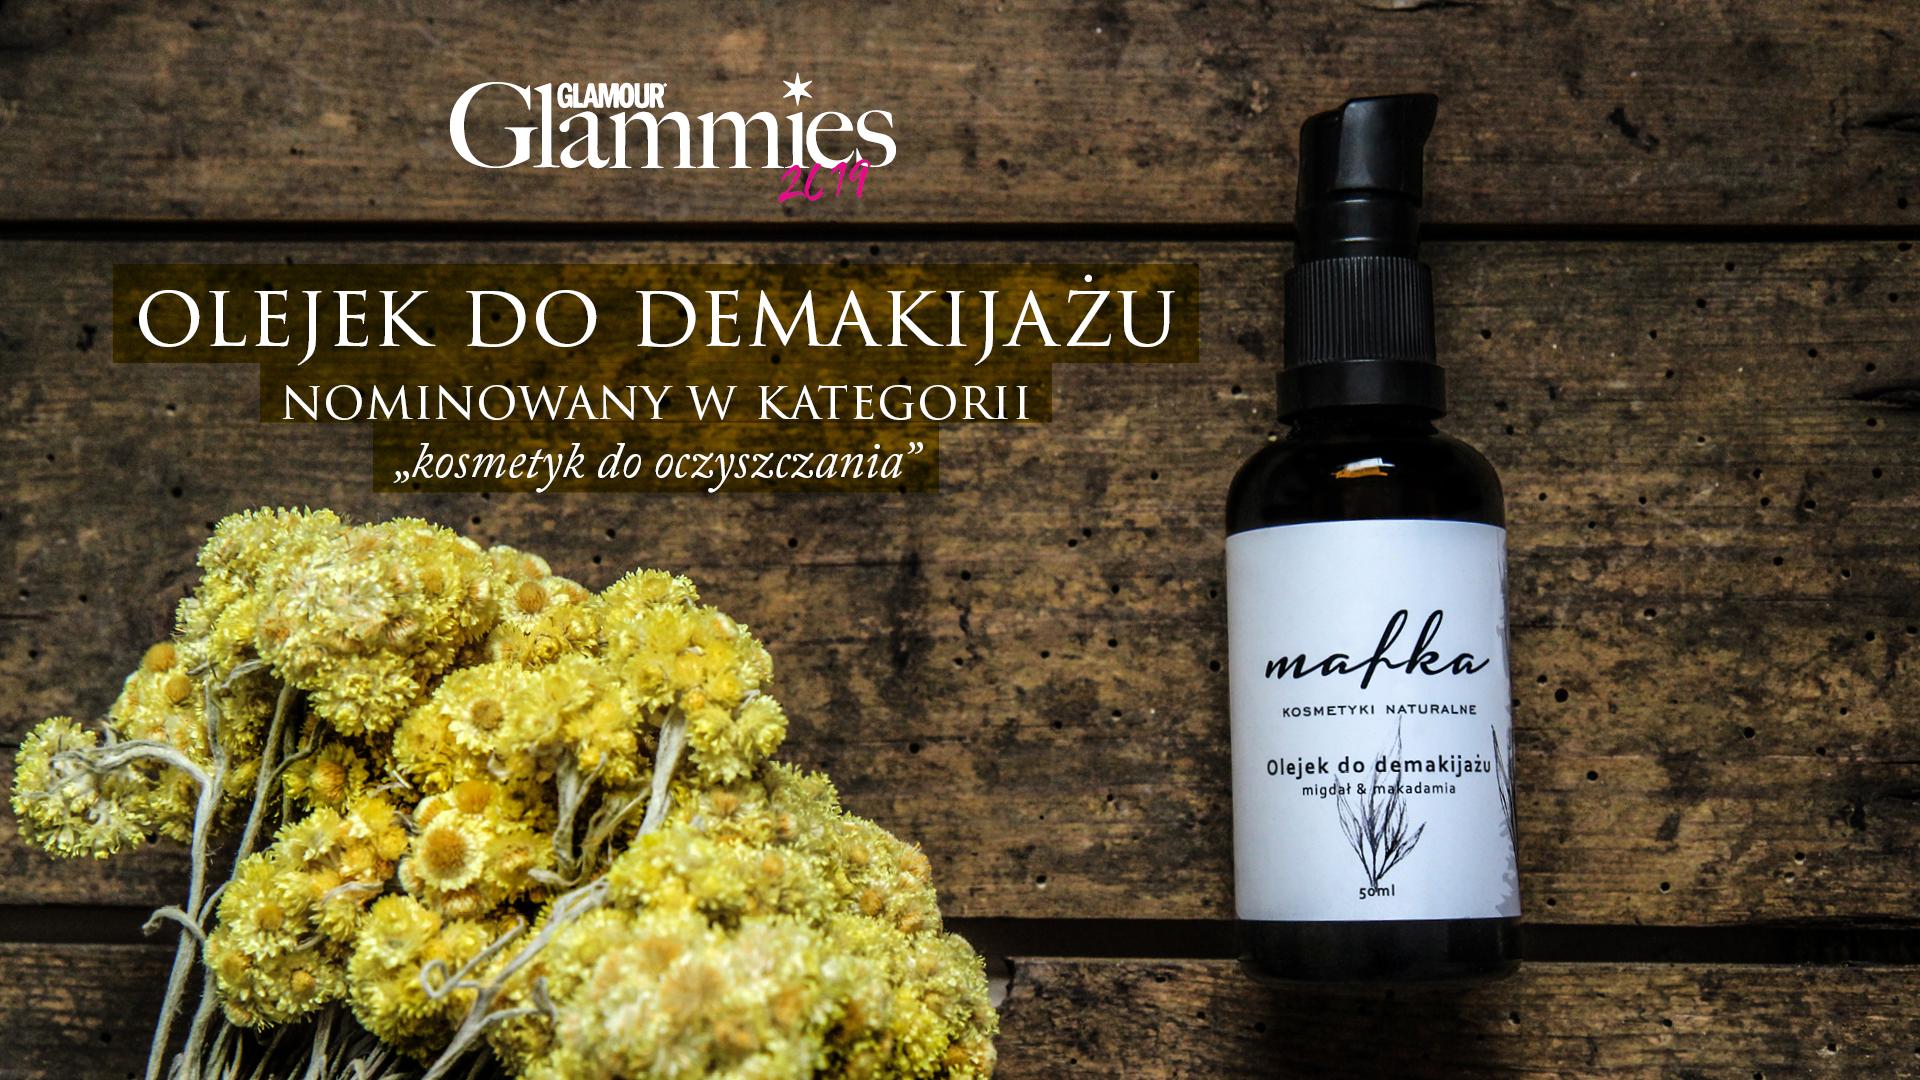 glammies-2019-olejek-do-demakijazu